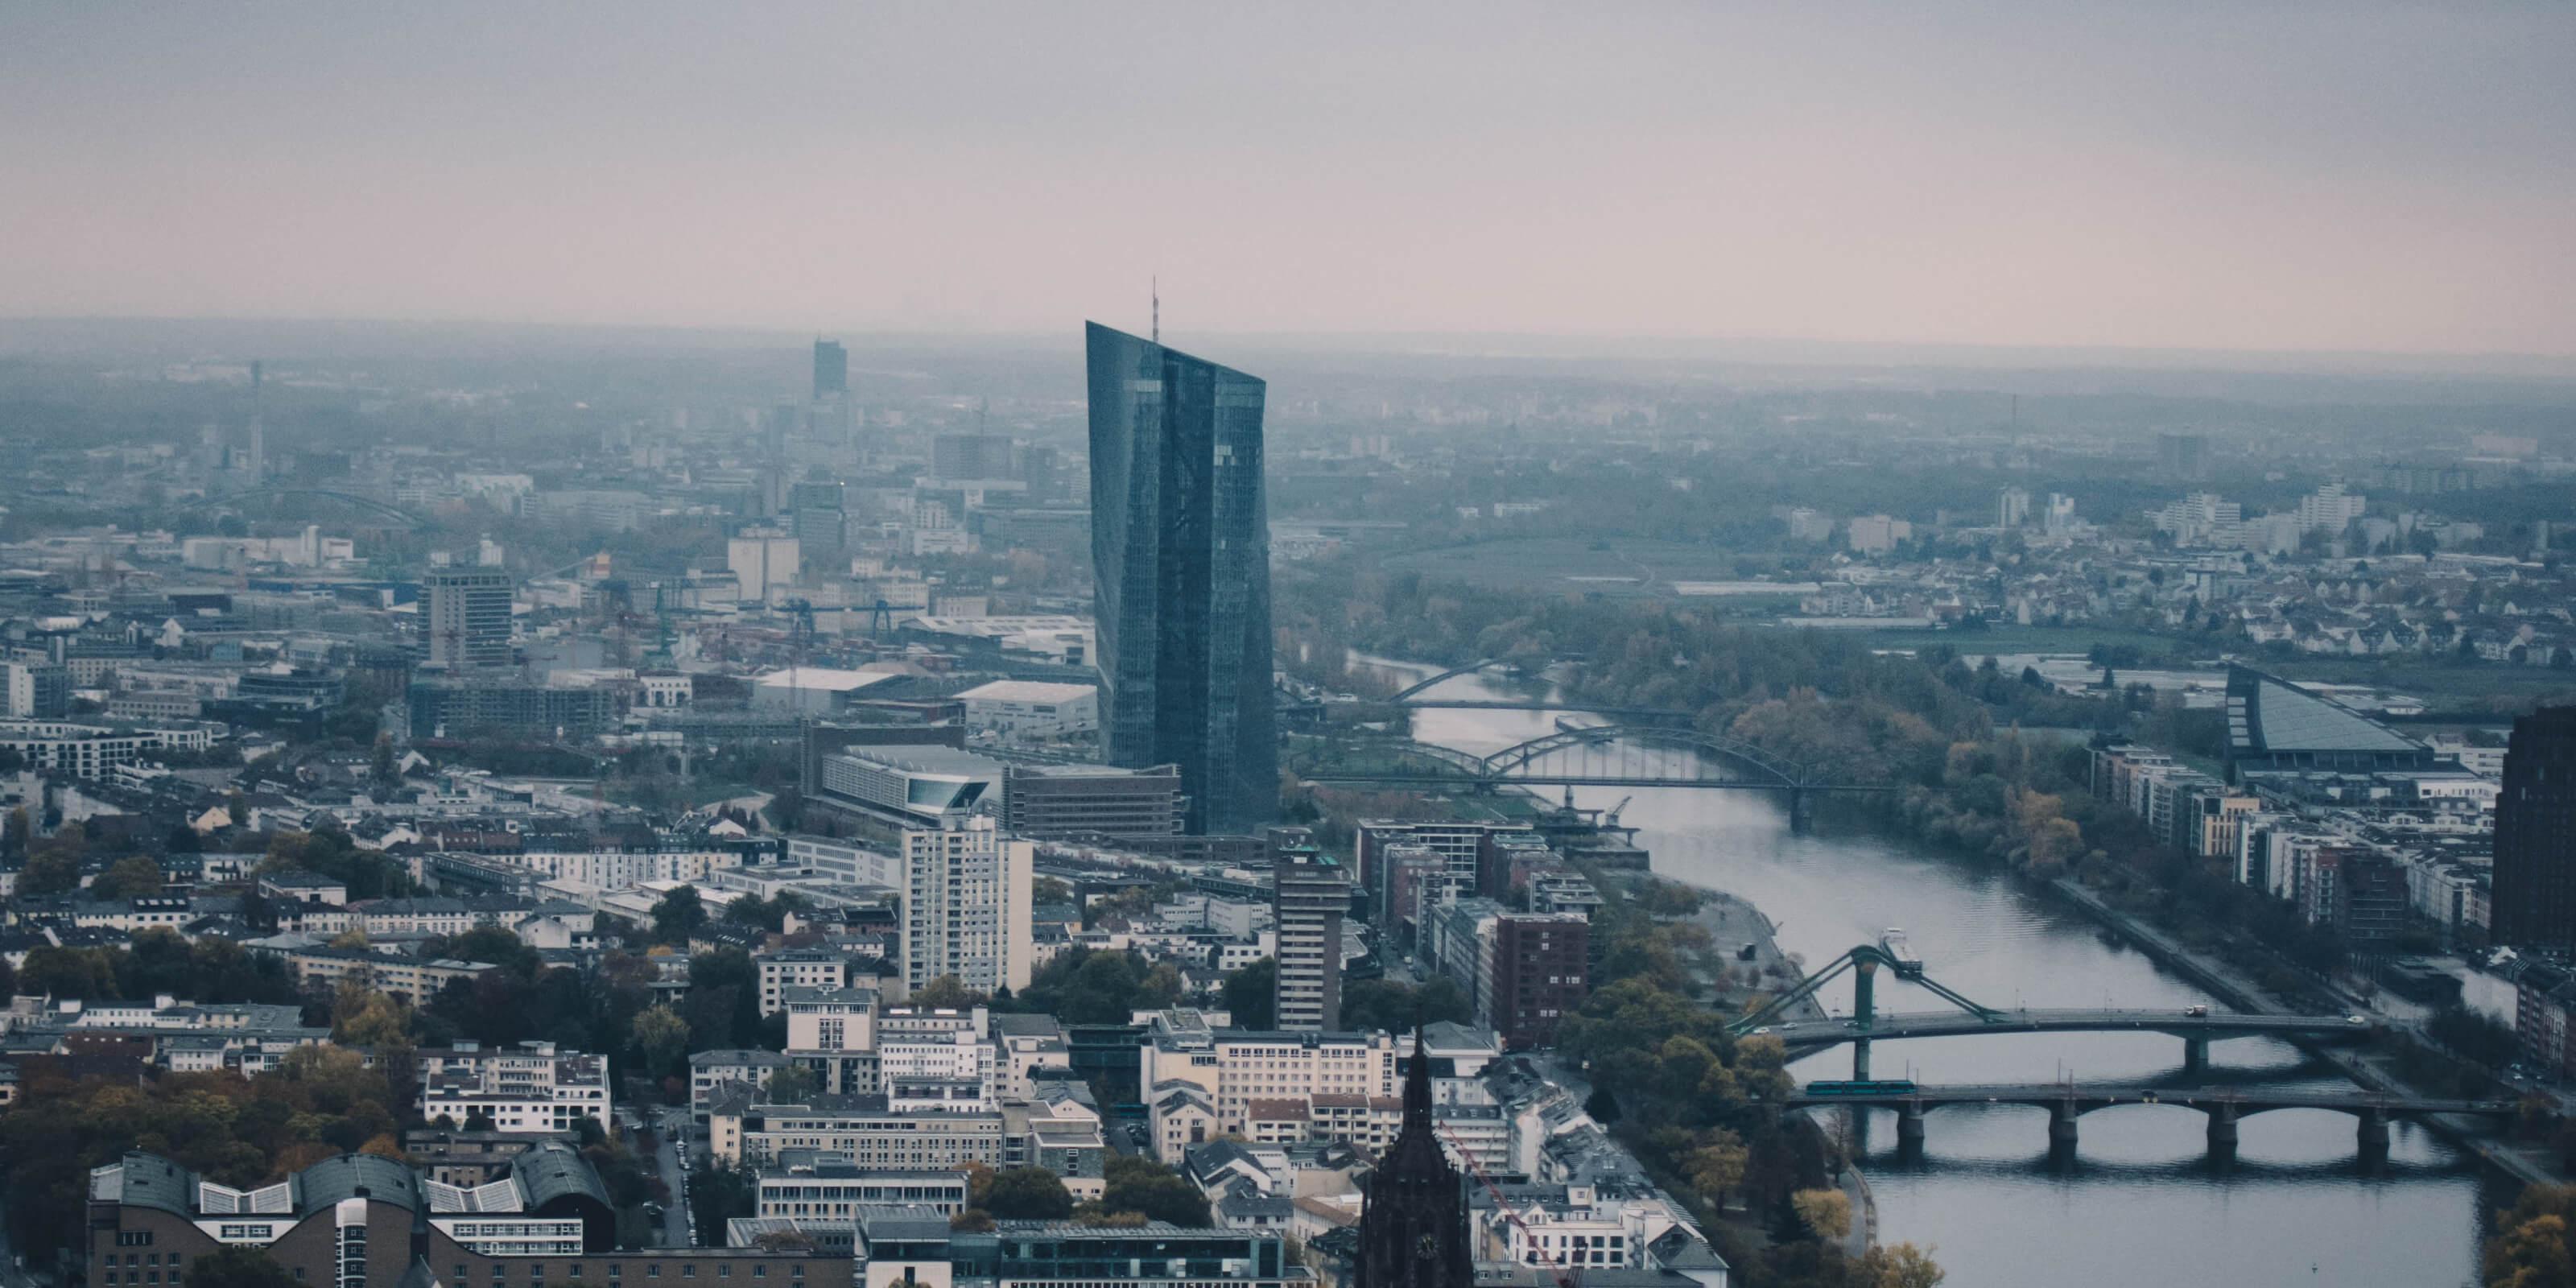 frankfurt aerial city view